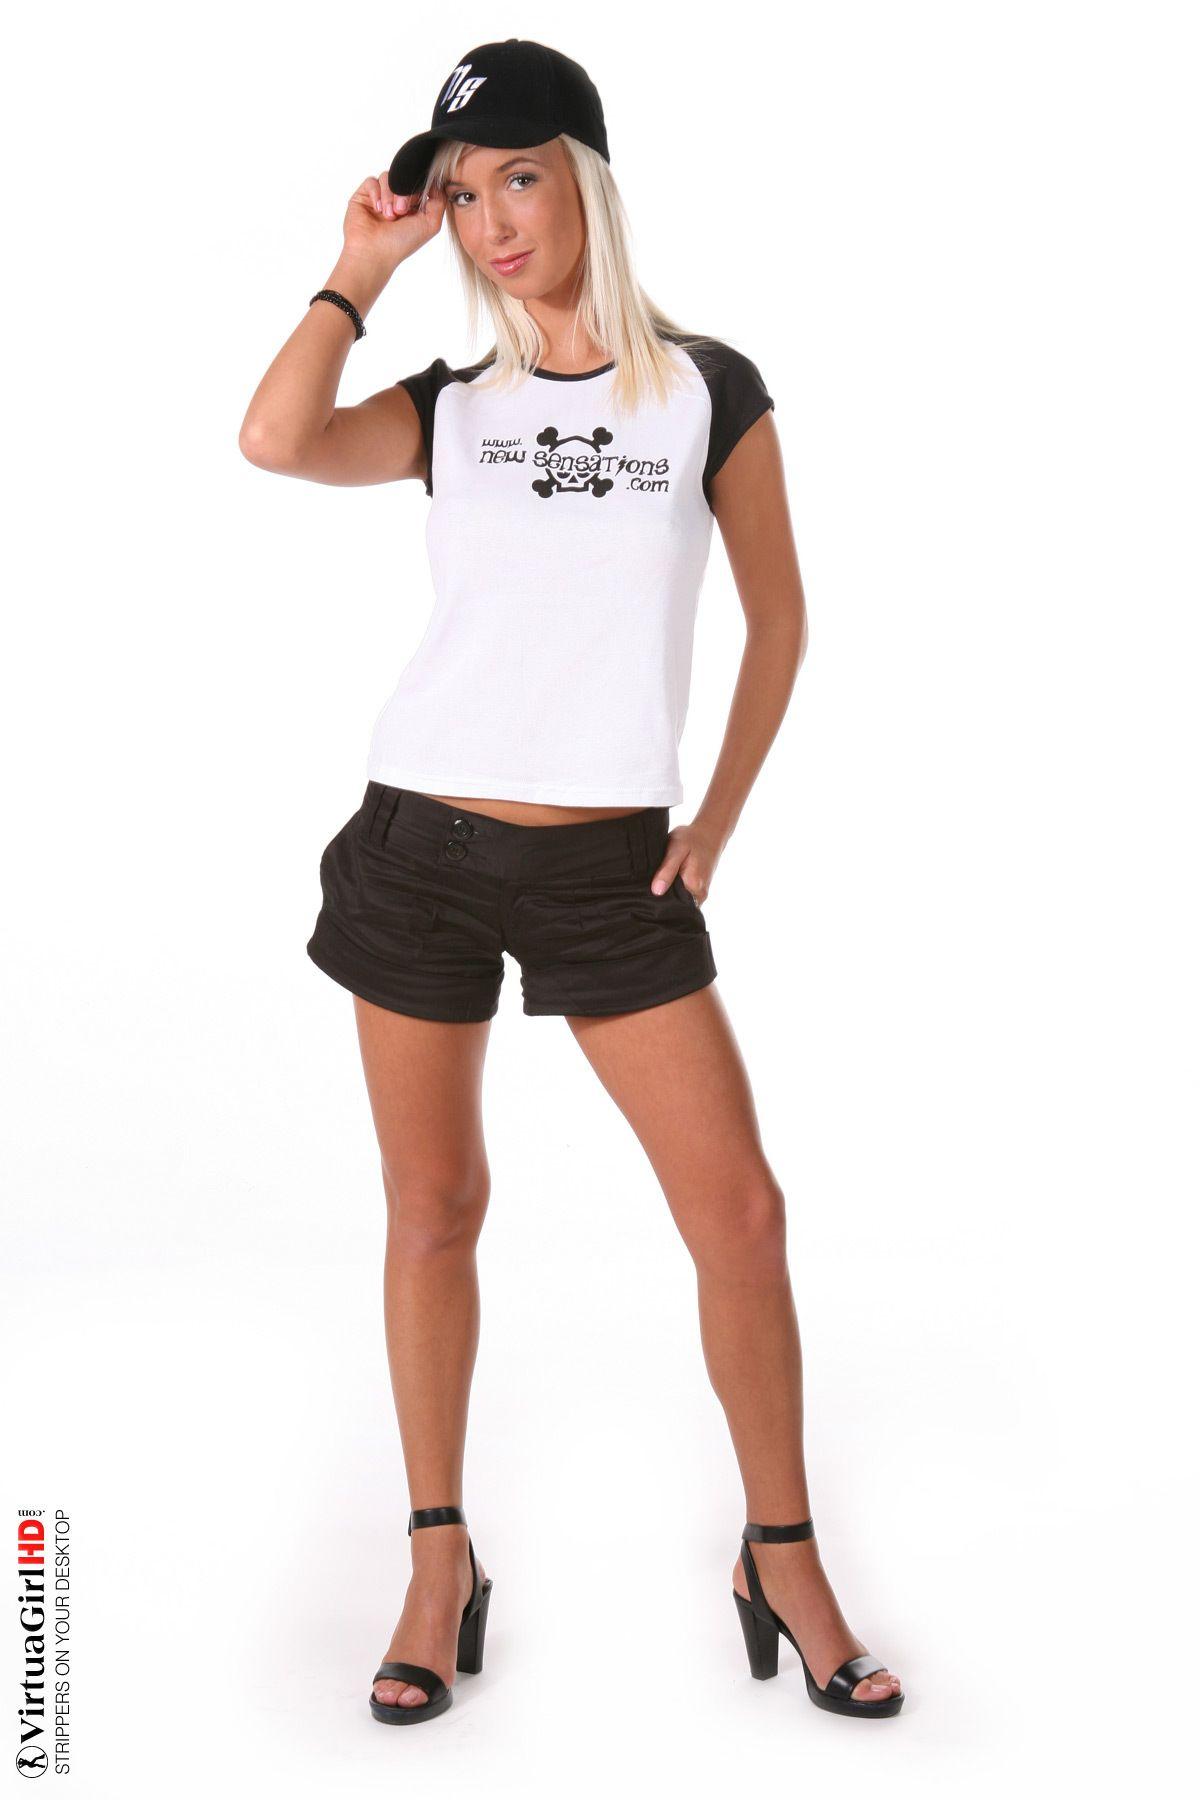 Natali Blond NEW SENSATIONS 01